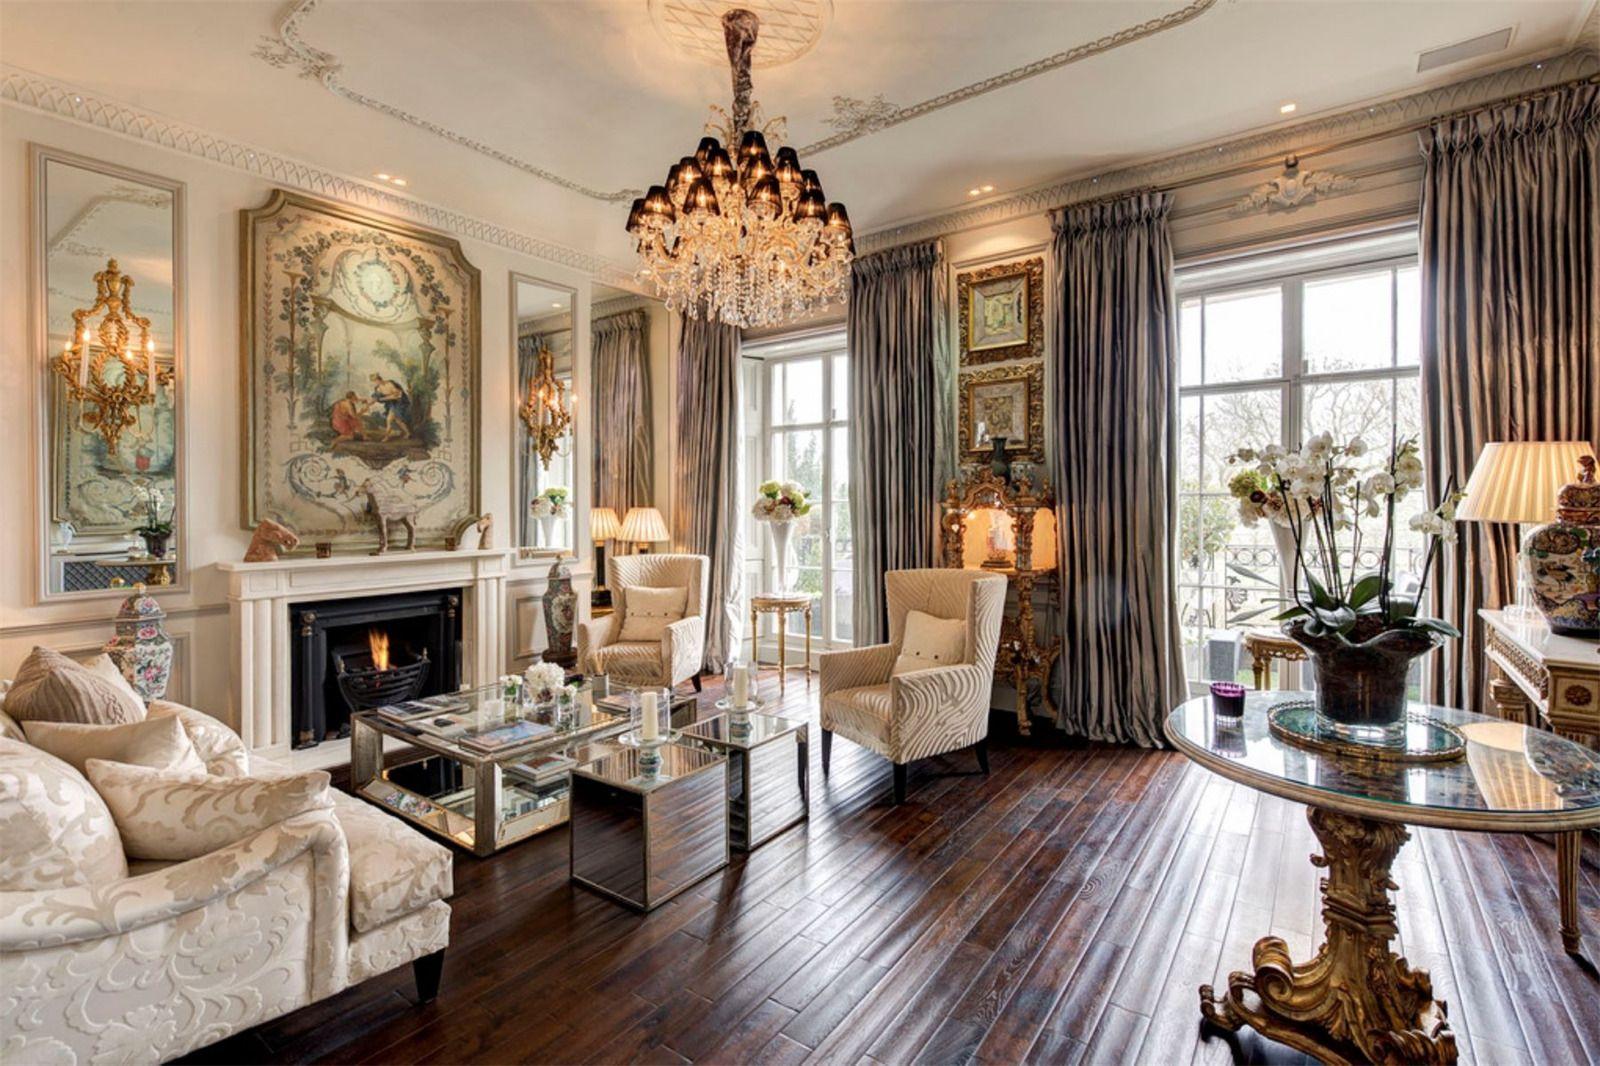 London, England, United Kingdom Luxury Home Rental (With